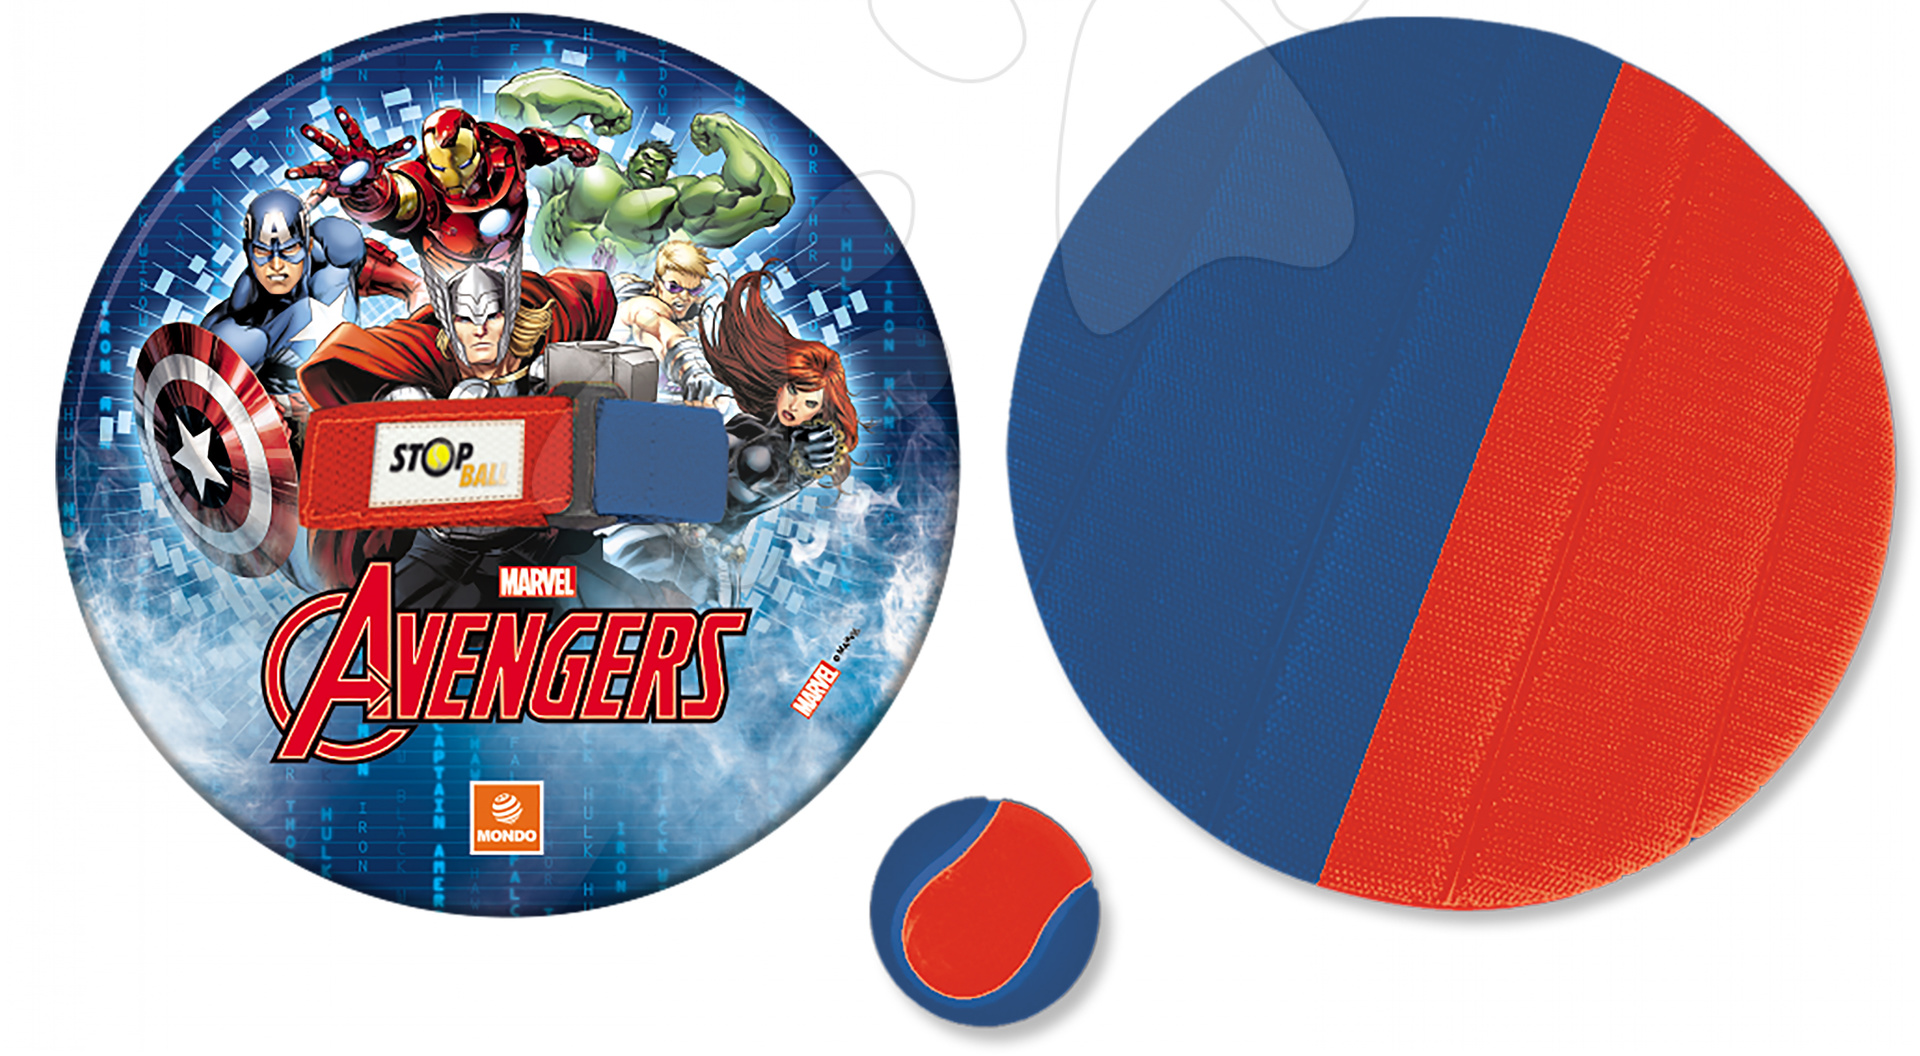 Športové hry pre najmenších - Hra Avengers Stop Ball Mondo na suchý zips